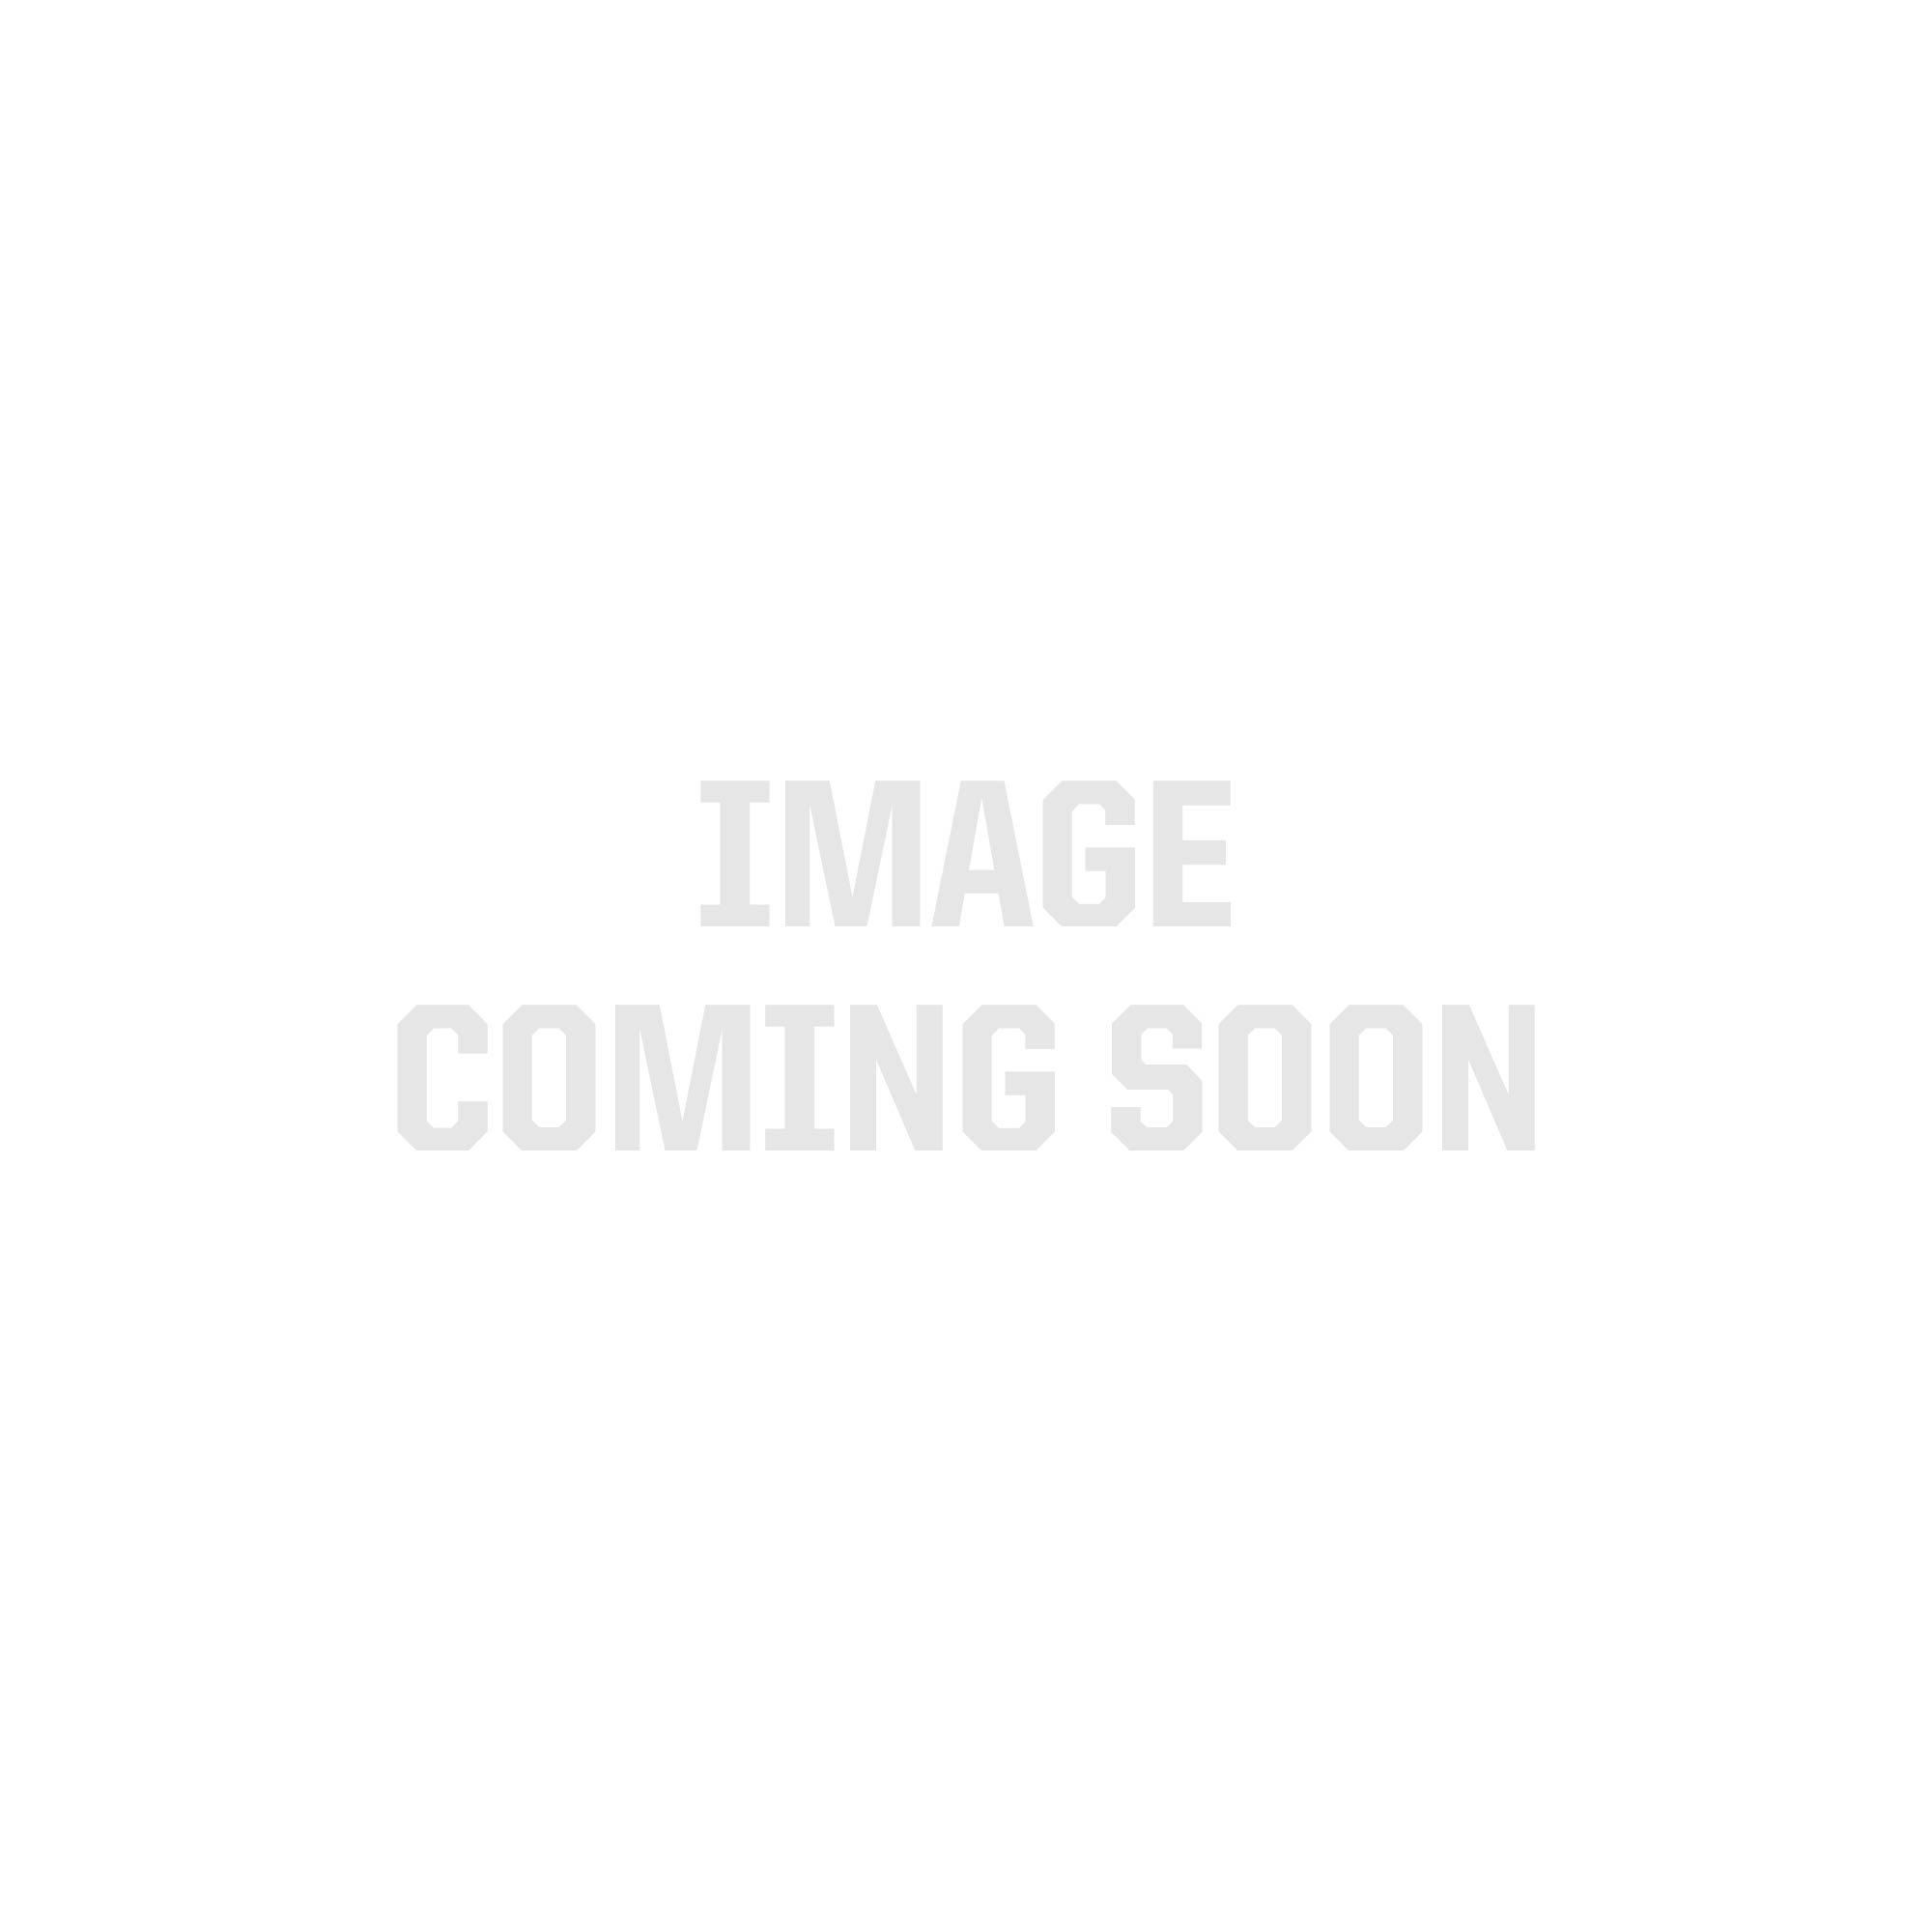 ebc00ee6cae63 Range Ready Merino Wool Long Sleeve - 5.11 Tactical